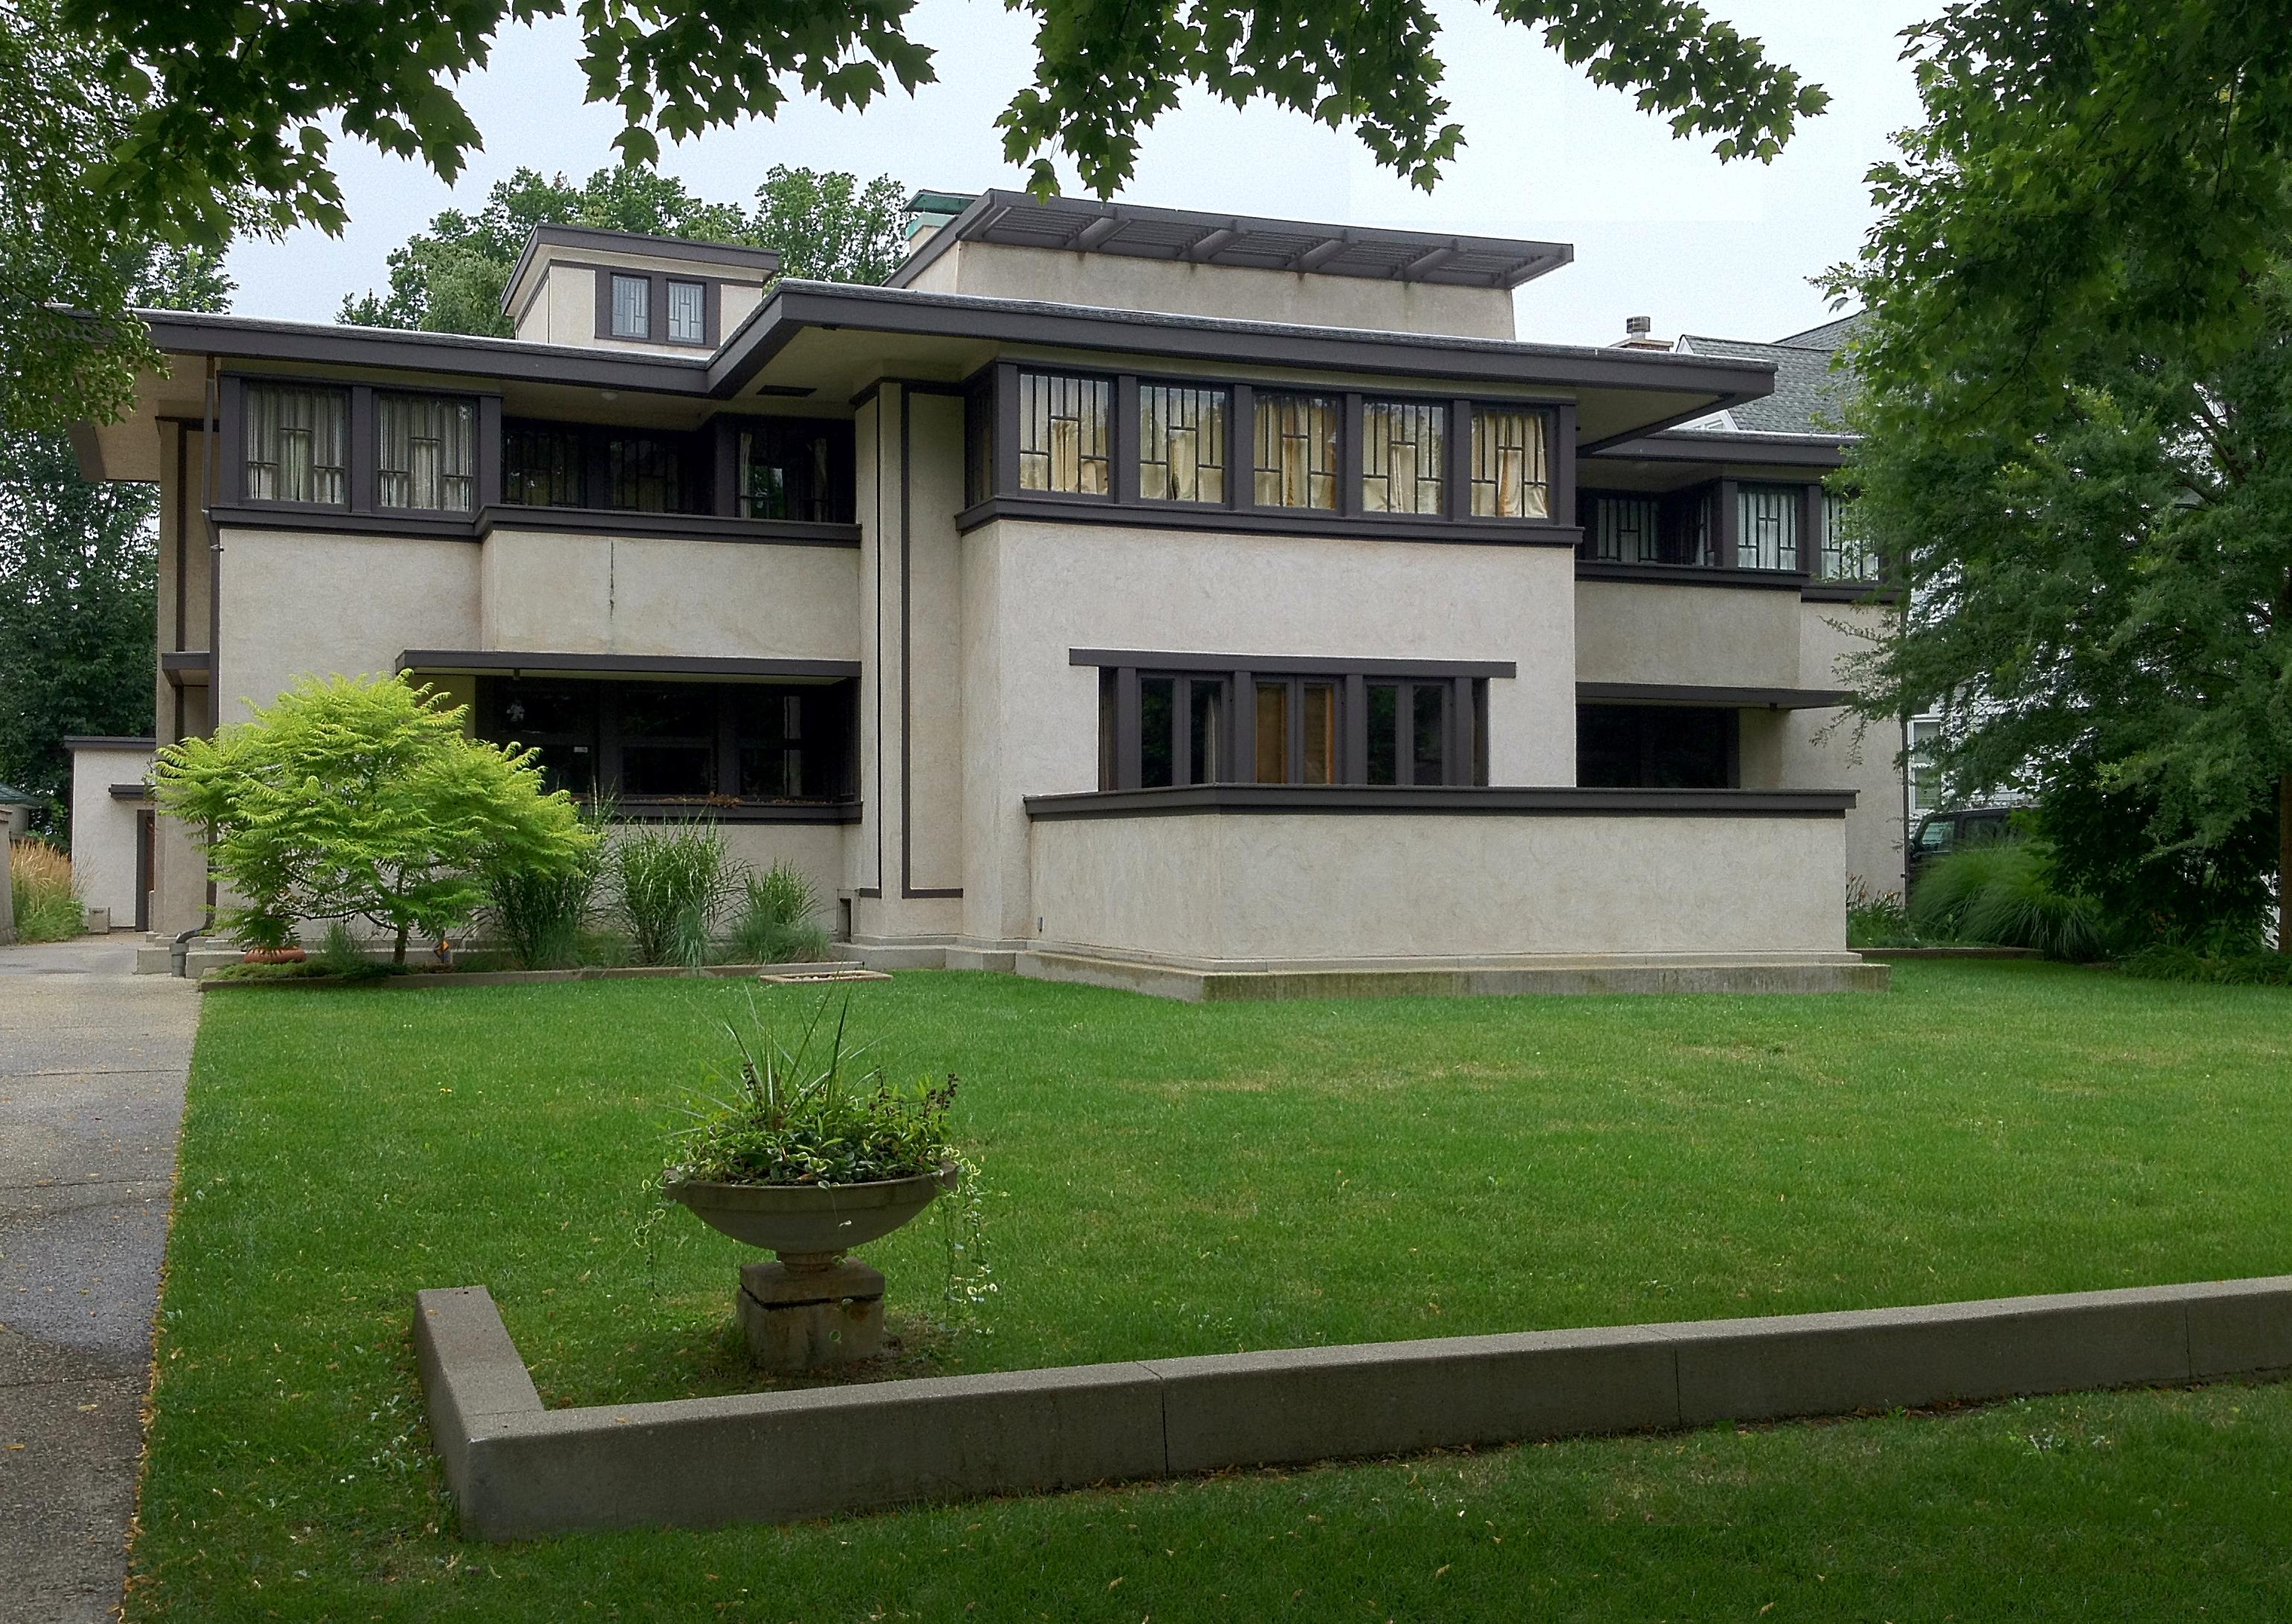 Frank Lloyd Wright's Oak Park Illinois Designs The Prairie